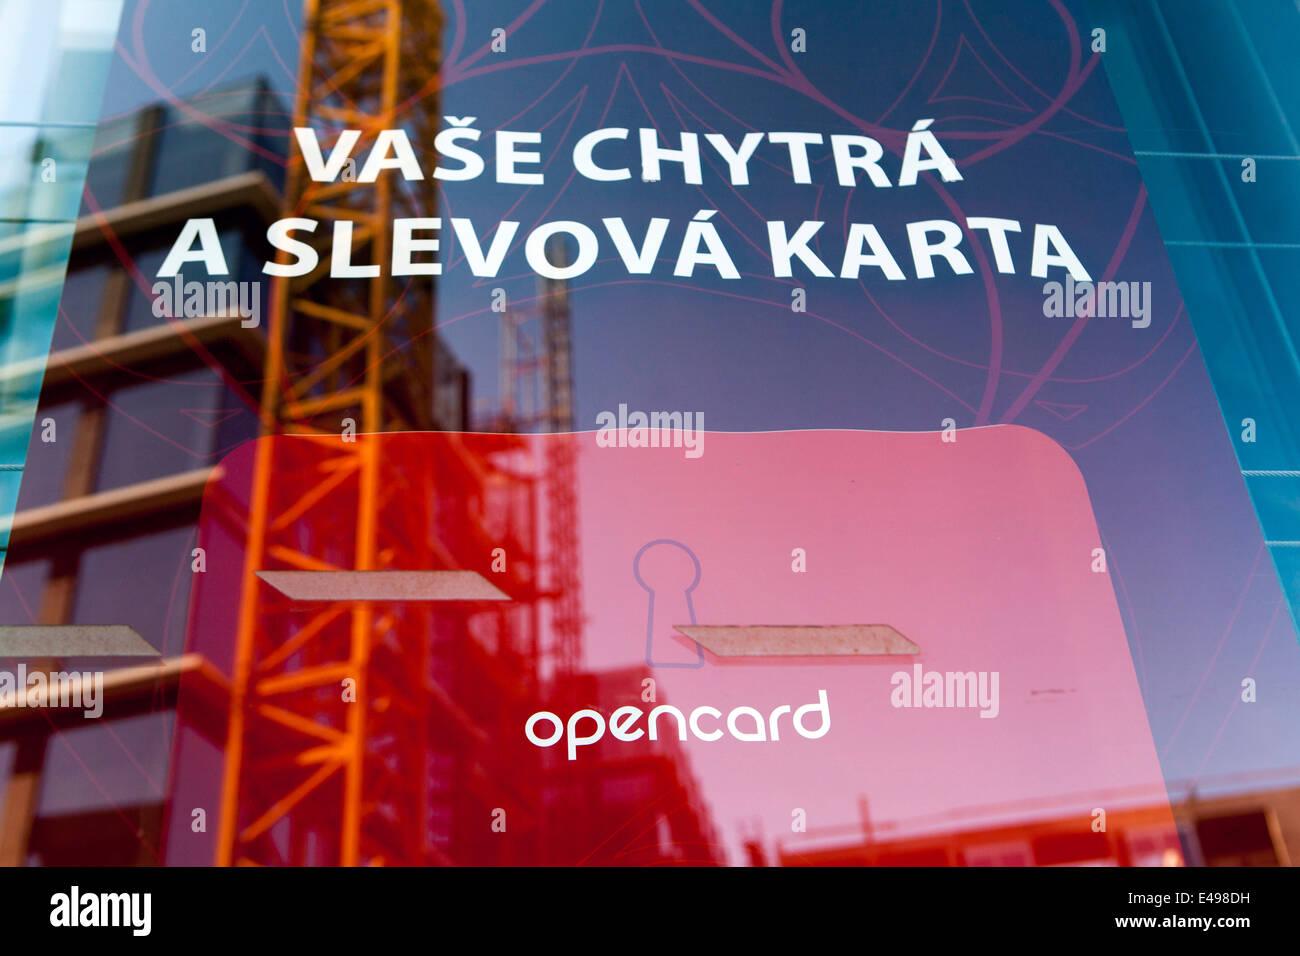 Opencard Prague public transport ticket Czech - Stock Image